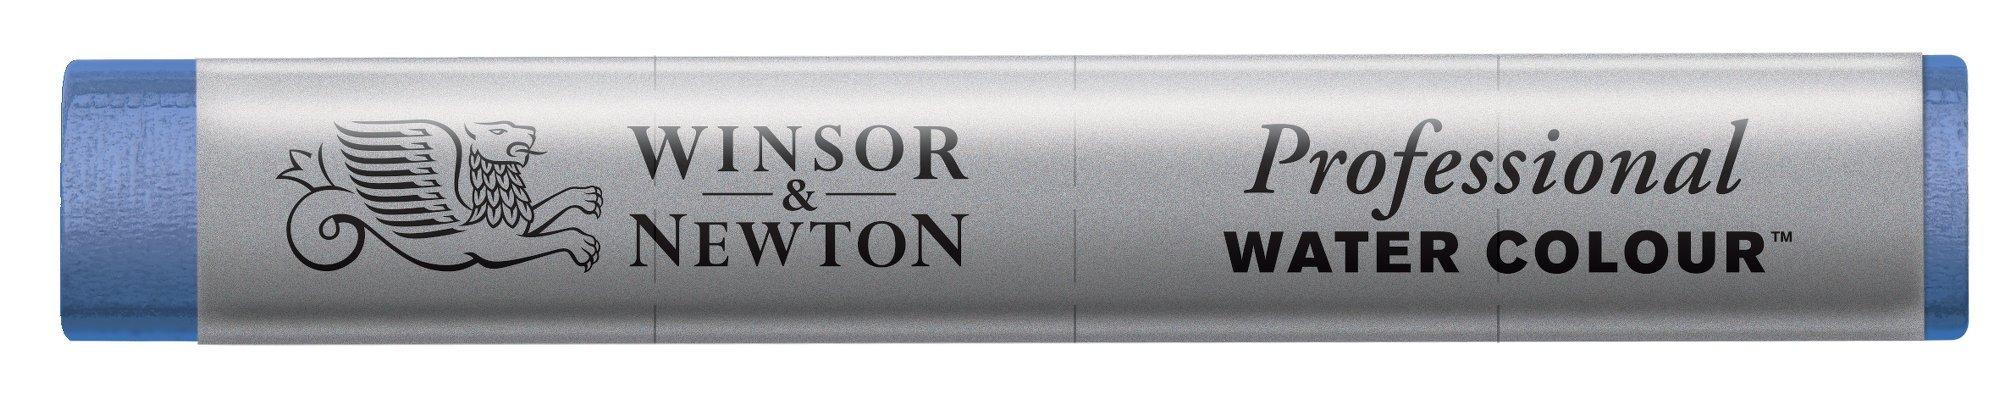 Winsor & Newton Professional Water Colour Stick, Cobalt Blue